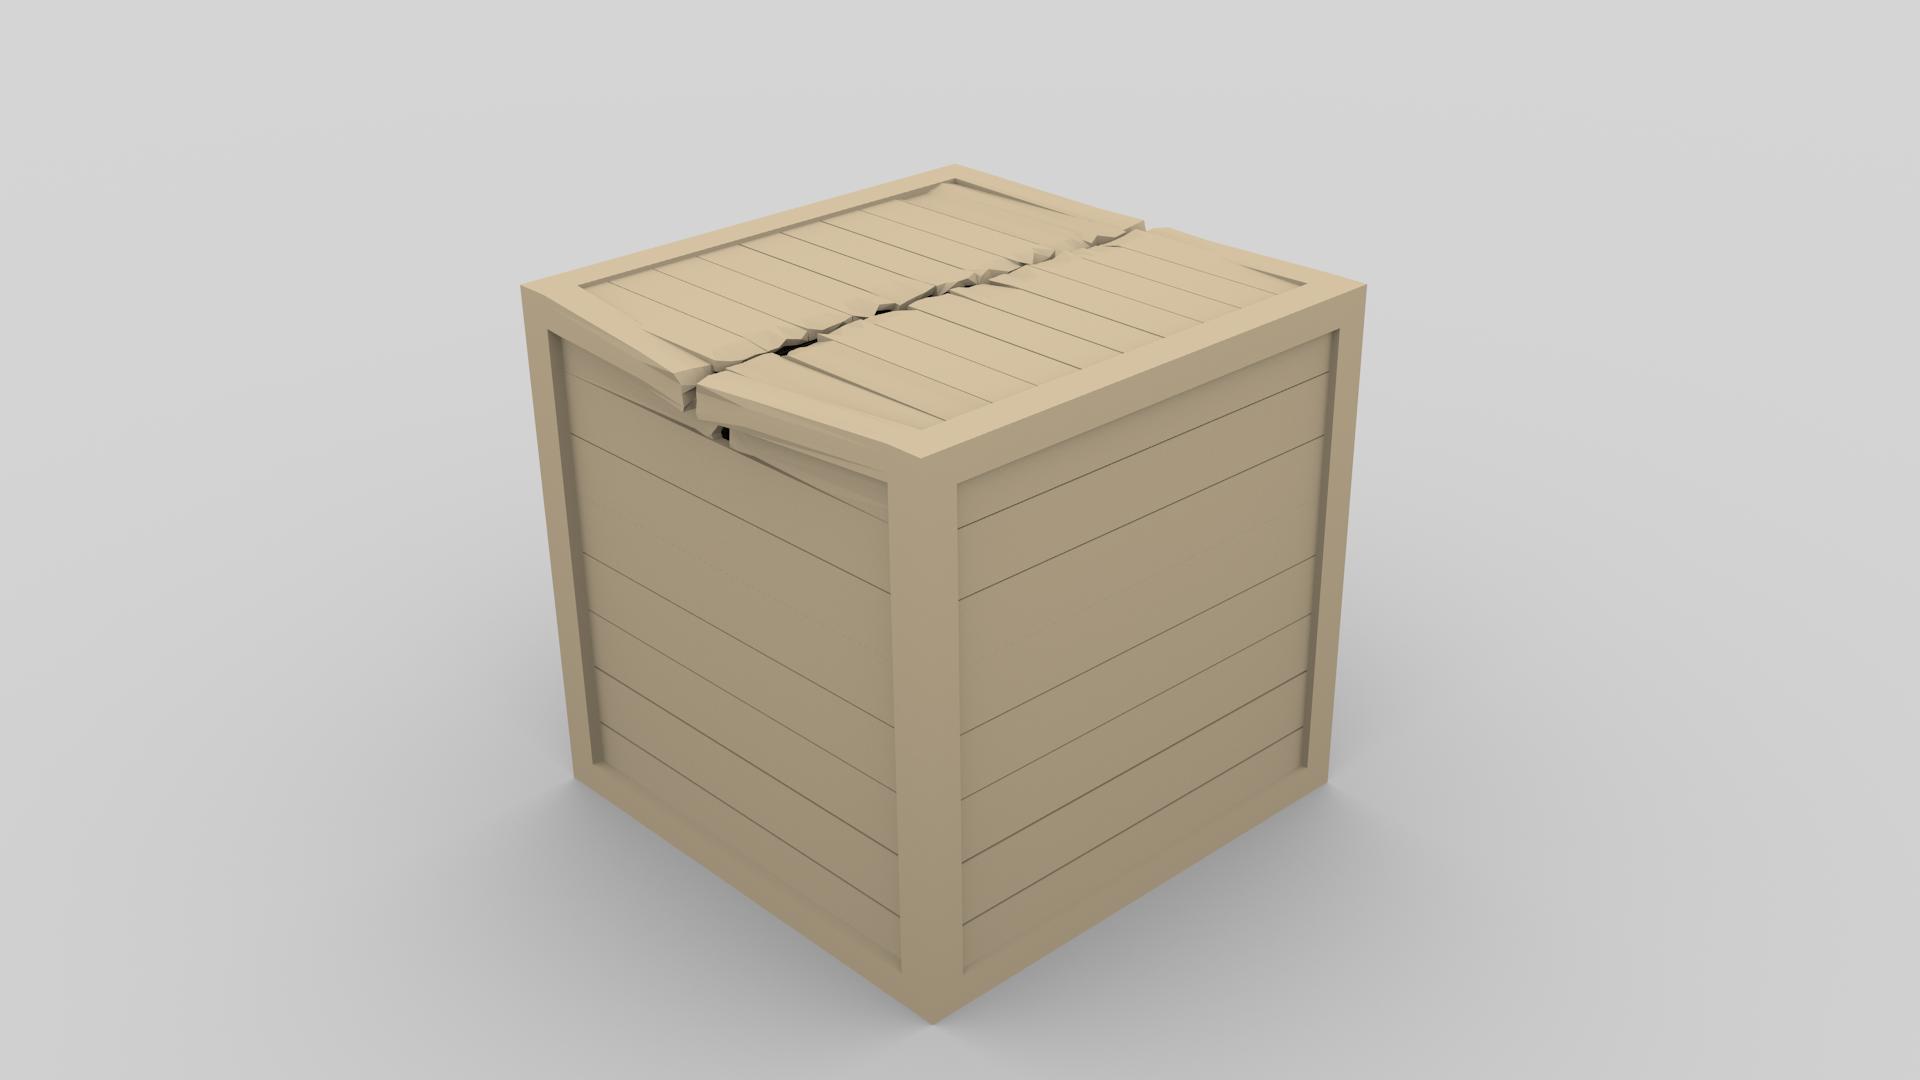 render_crate_02.png